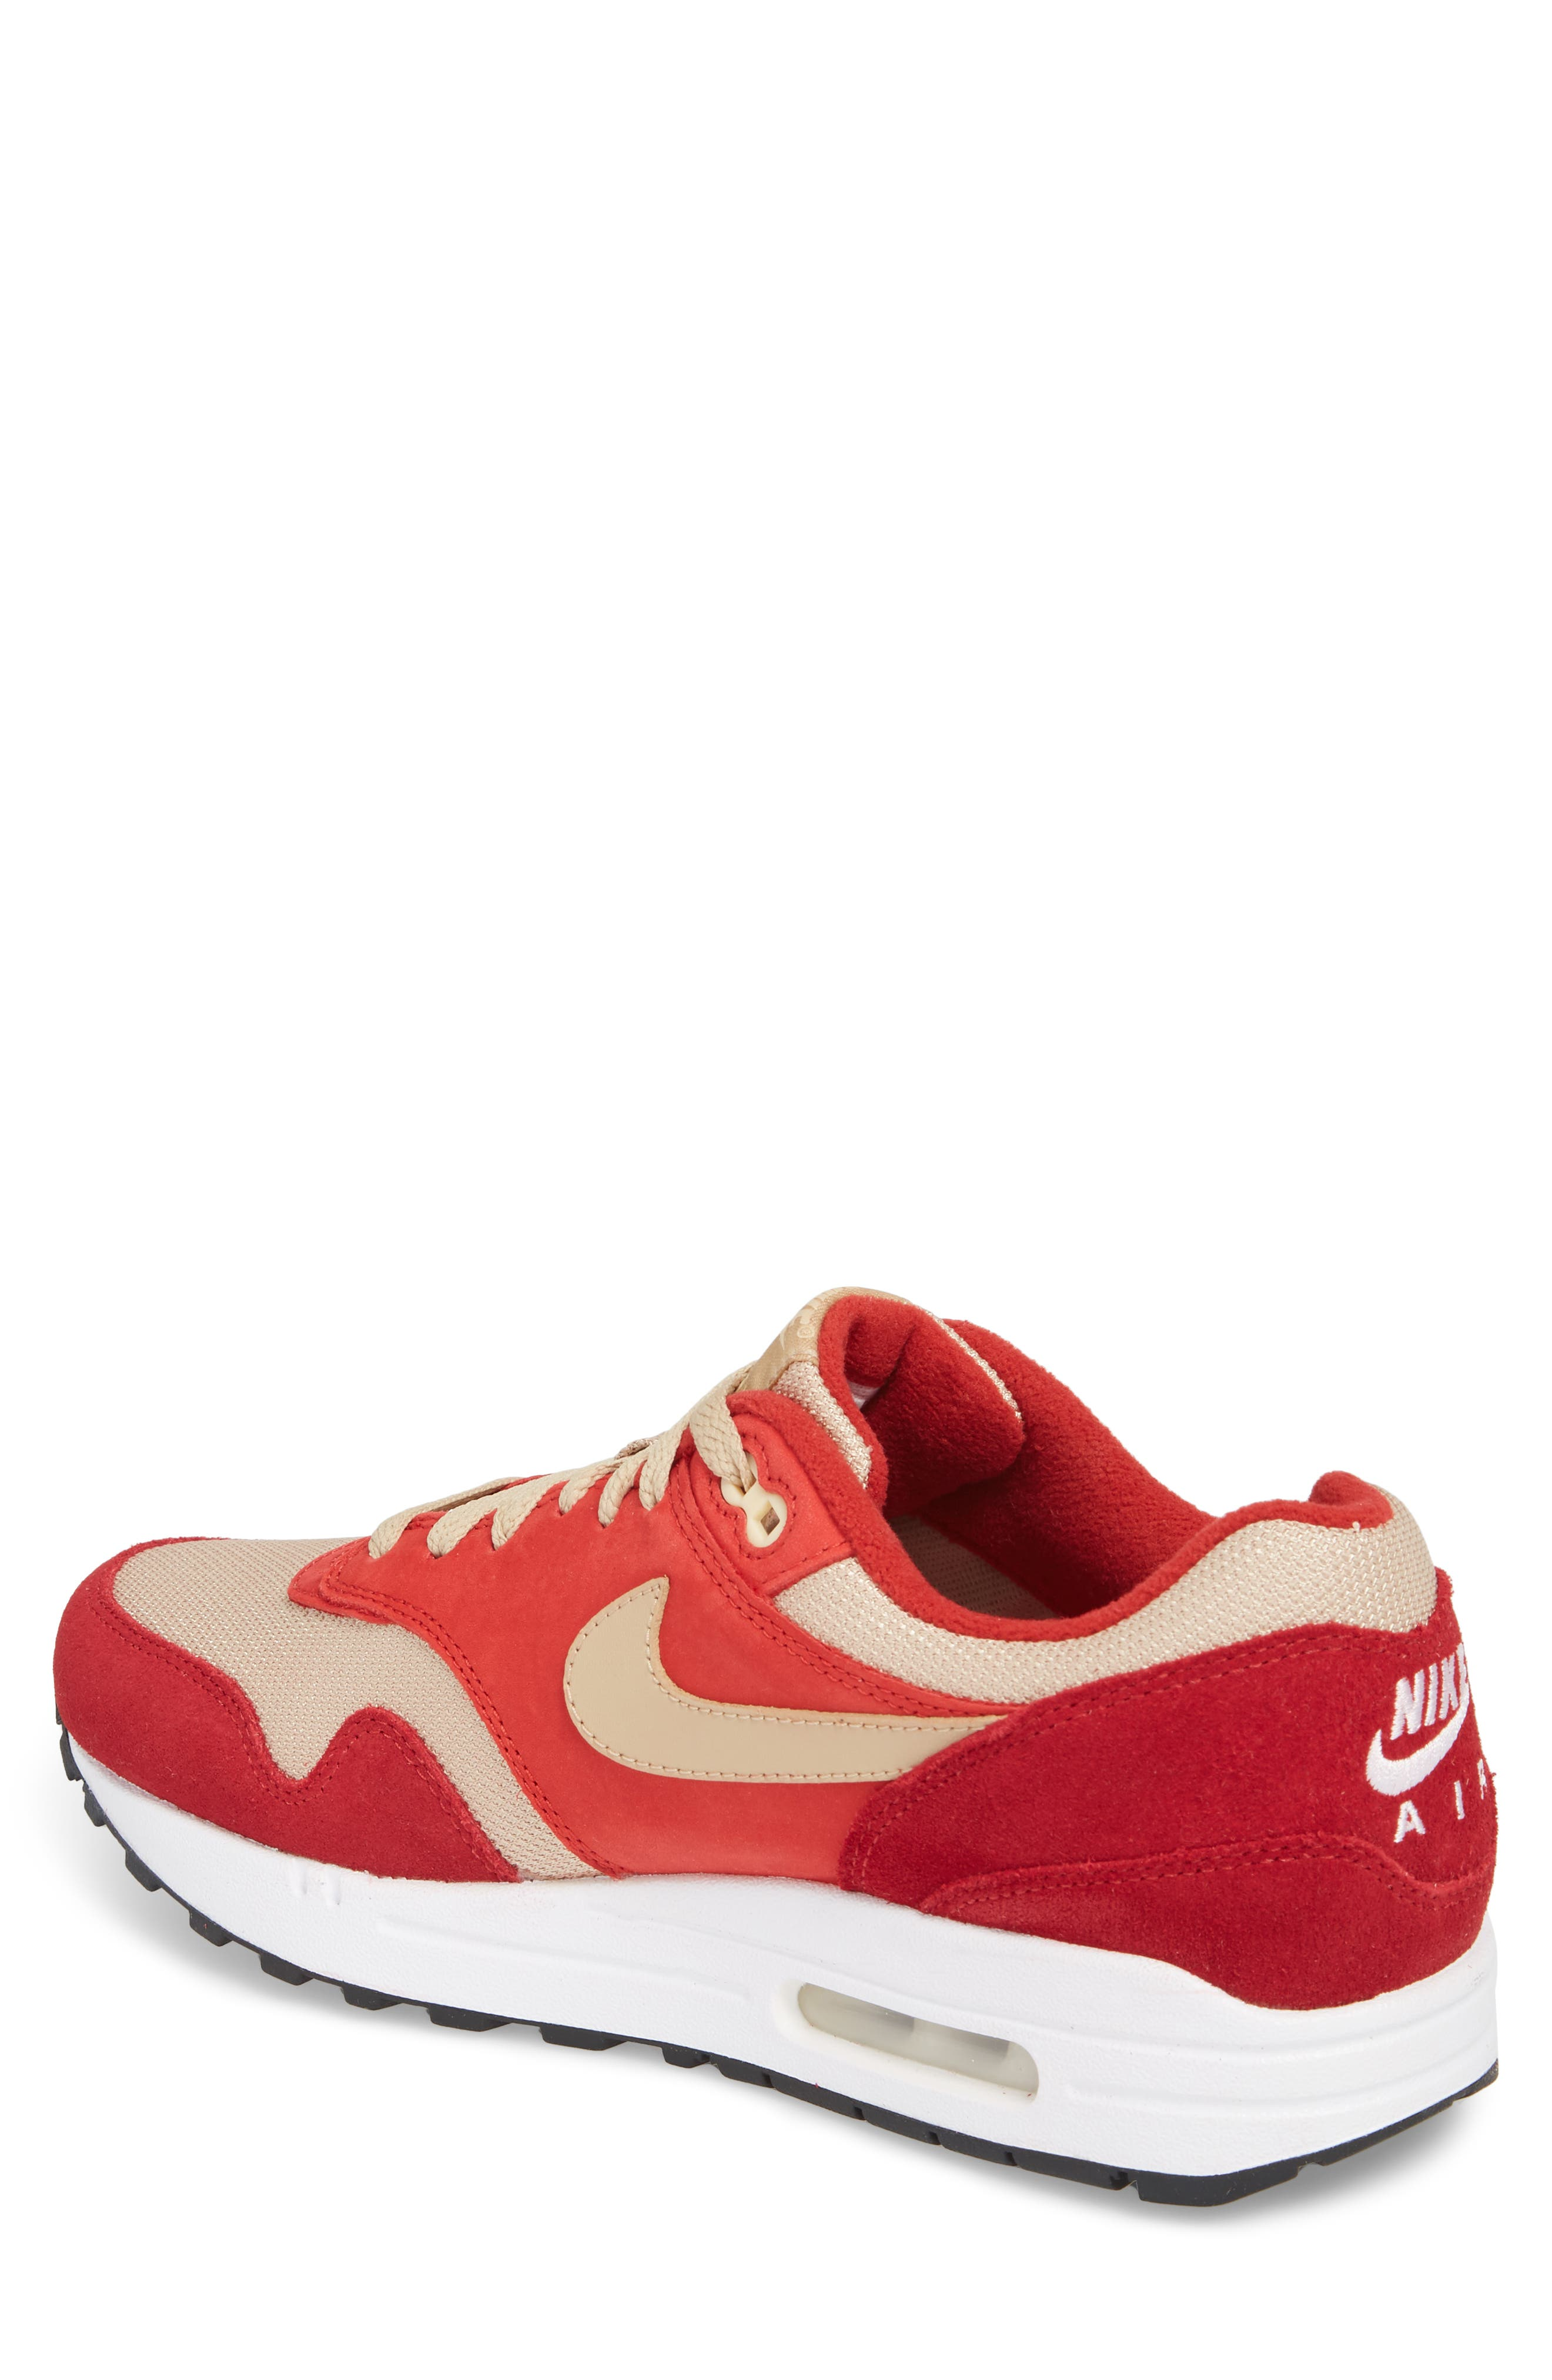 Air Max 1 Premium Retro Sneaker,                             Alternate thumbnail 2, color,                             Red/ Mushroom-Red-Vanilla